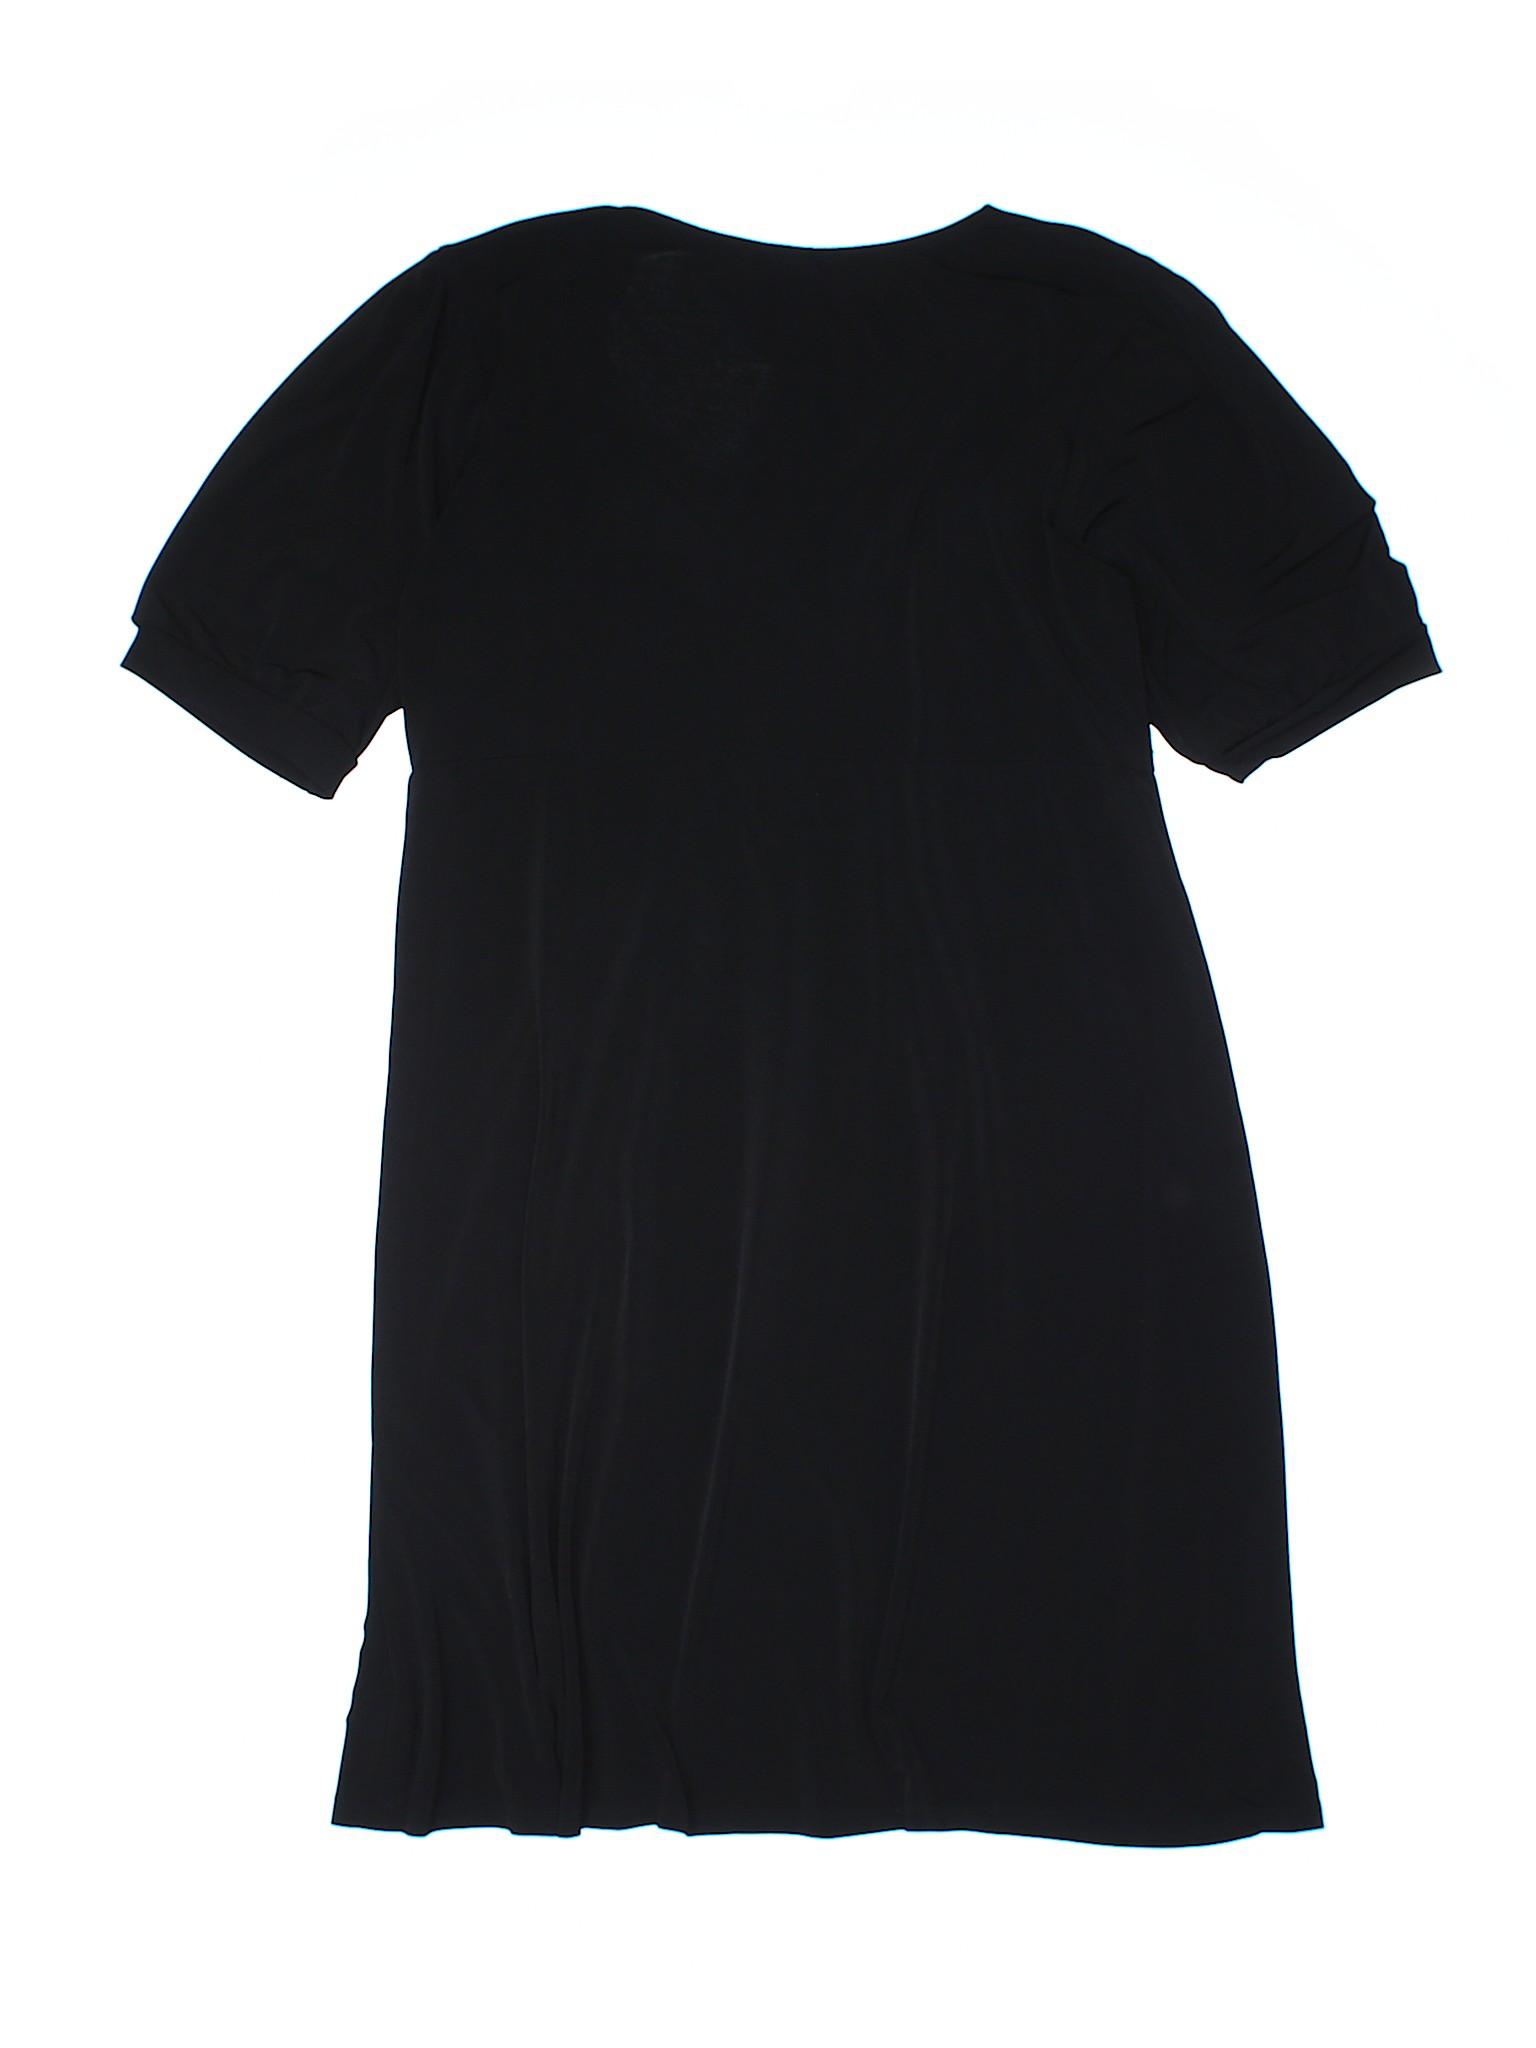 Selling Casual Selling Merona Casual Merona Dress Selling Dress fRRryI4